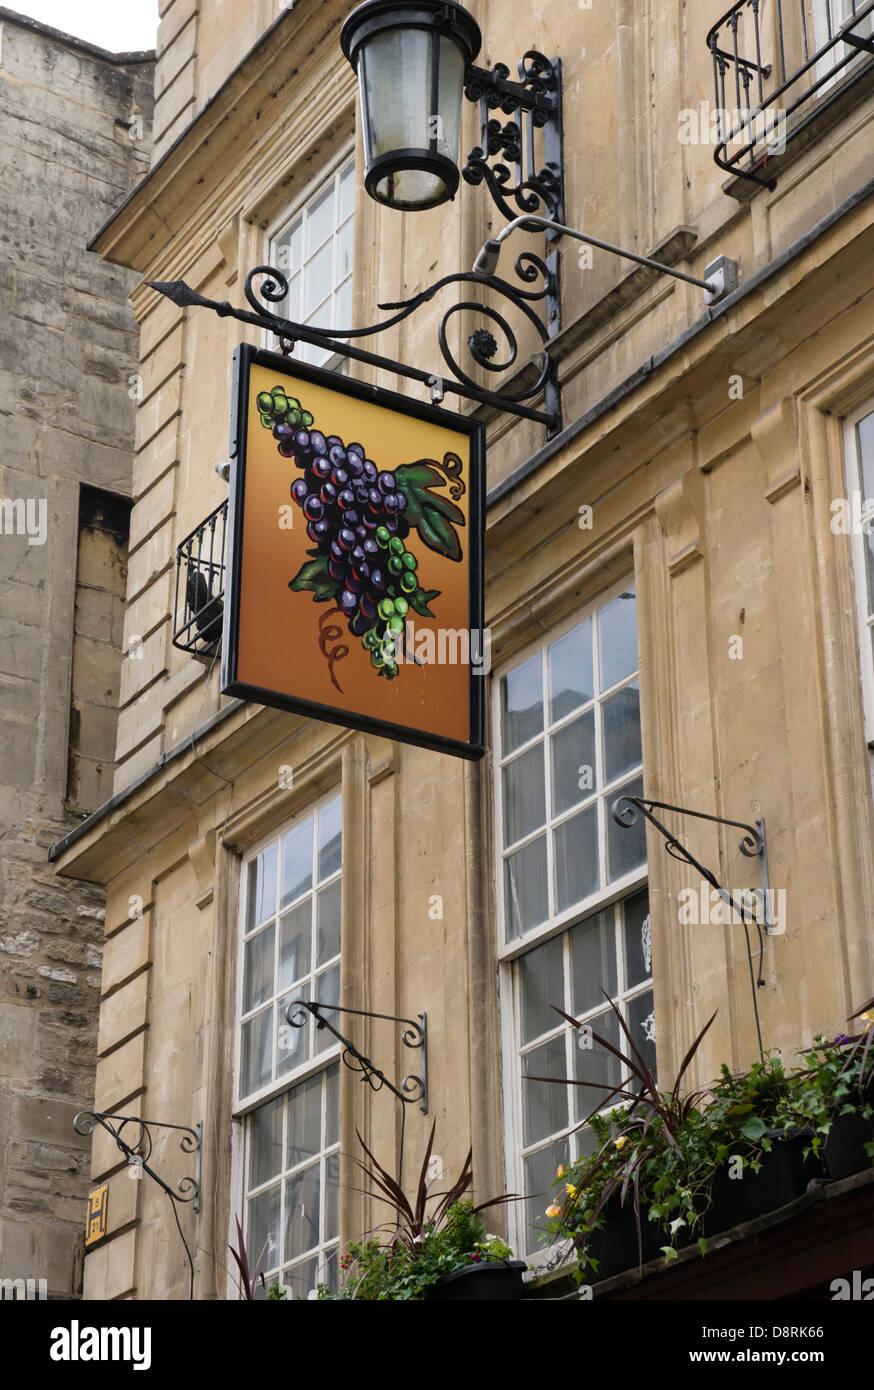 The Grapes Pub, Bath, a Georgian city in Somerset England UK - Stock Image